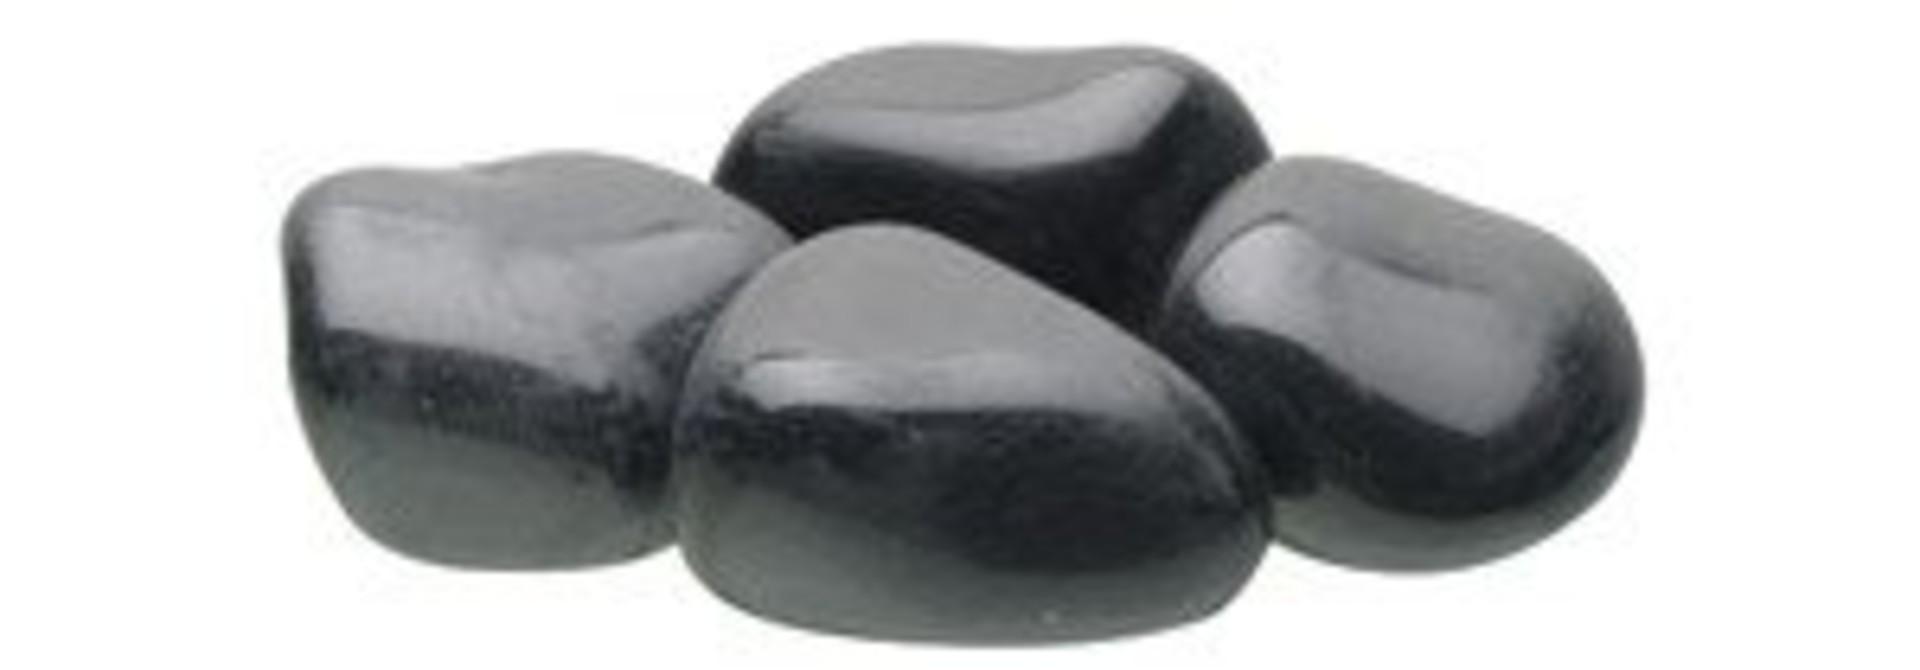 Fluval Polished Black Agate Stone 1.5 lb